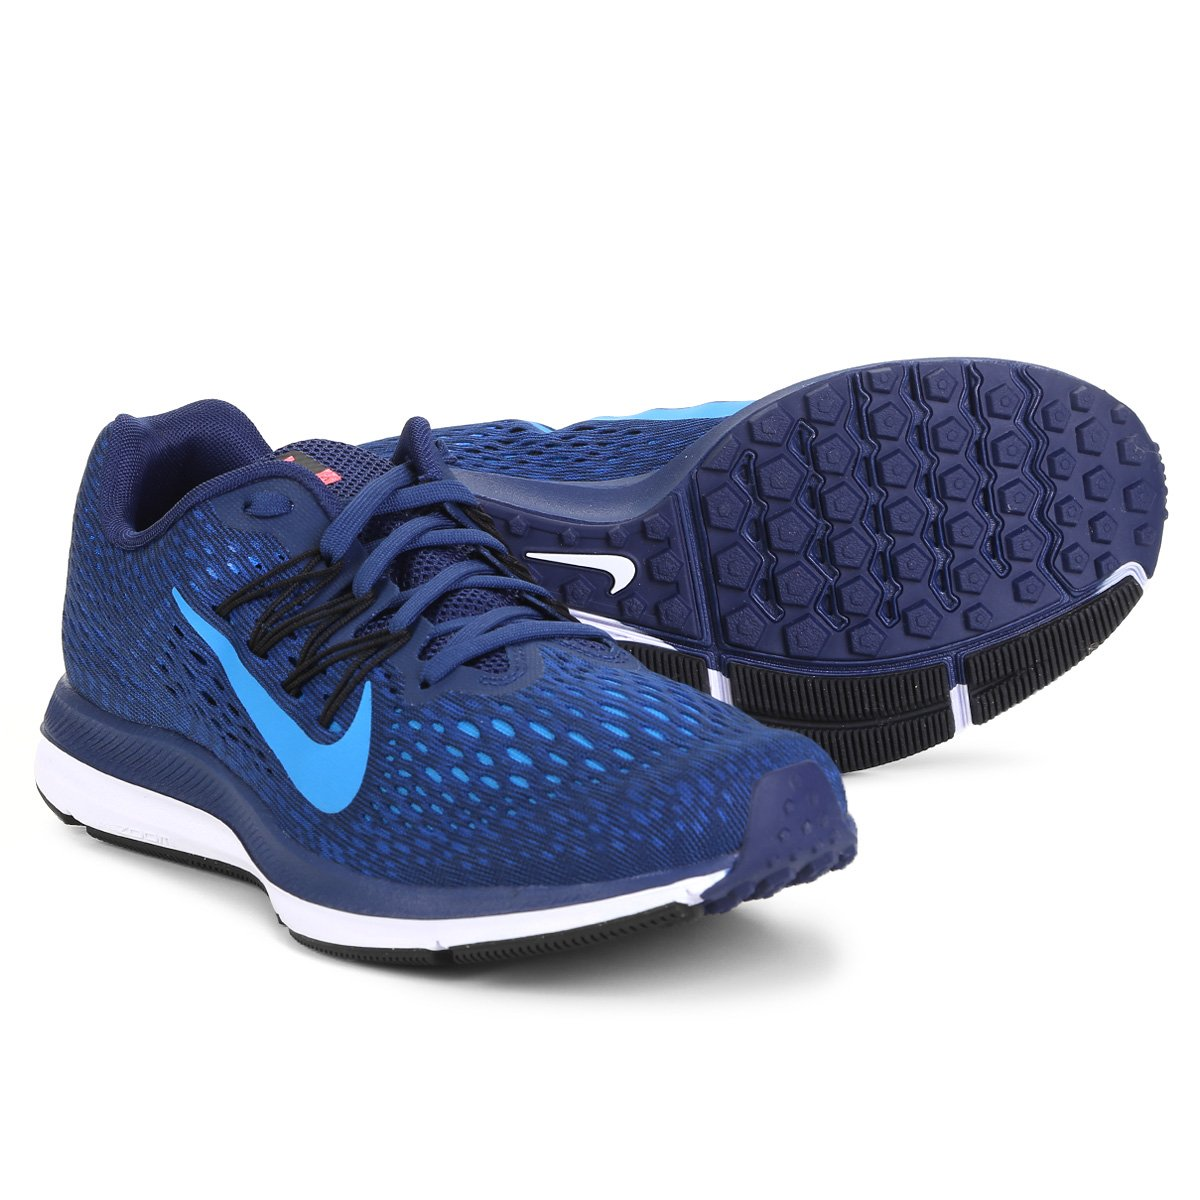 ed0e35ede4e Tênis Nike Zoom Winflo 5 Masculino - Compre Agora